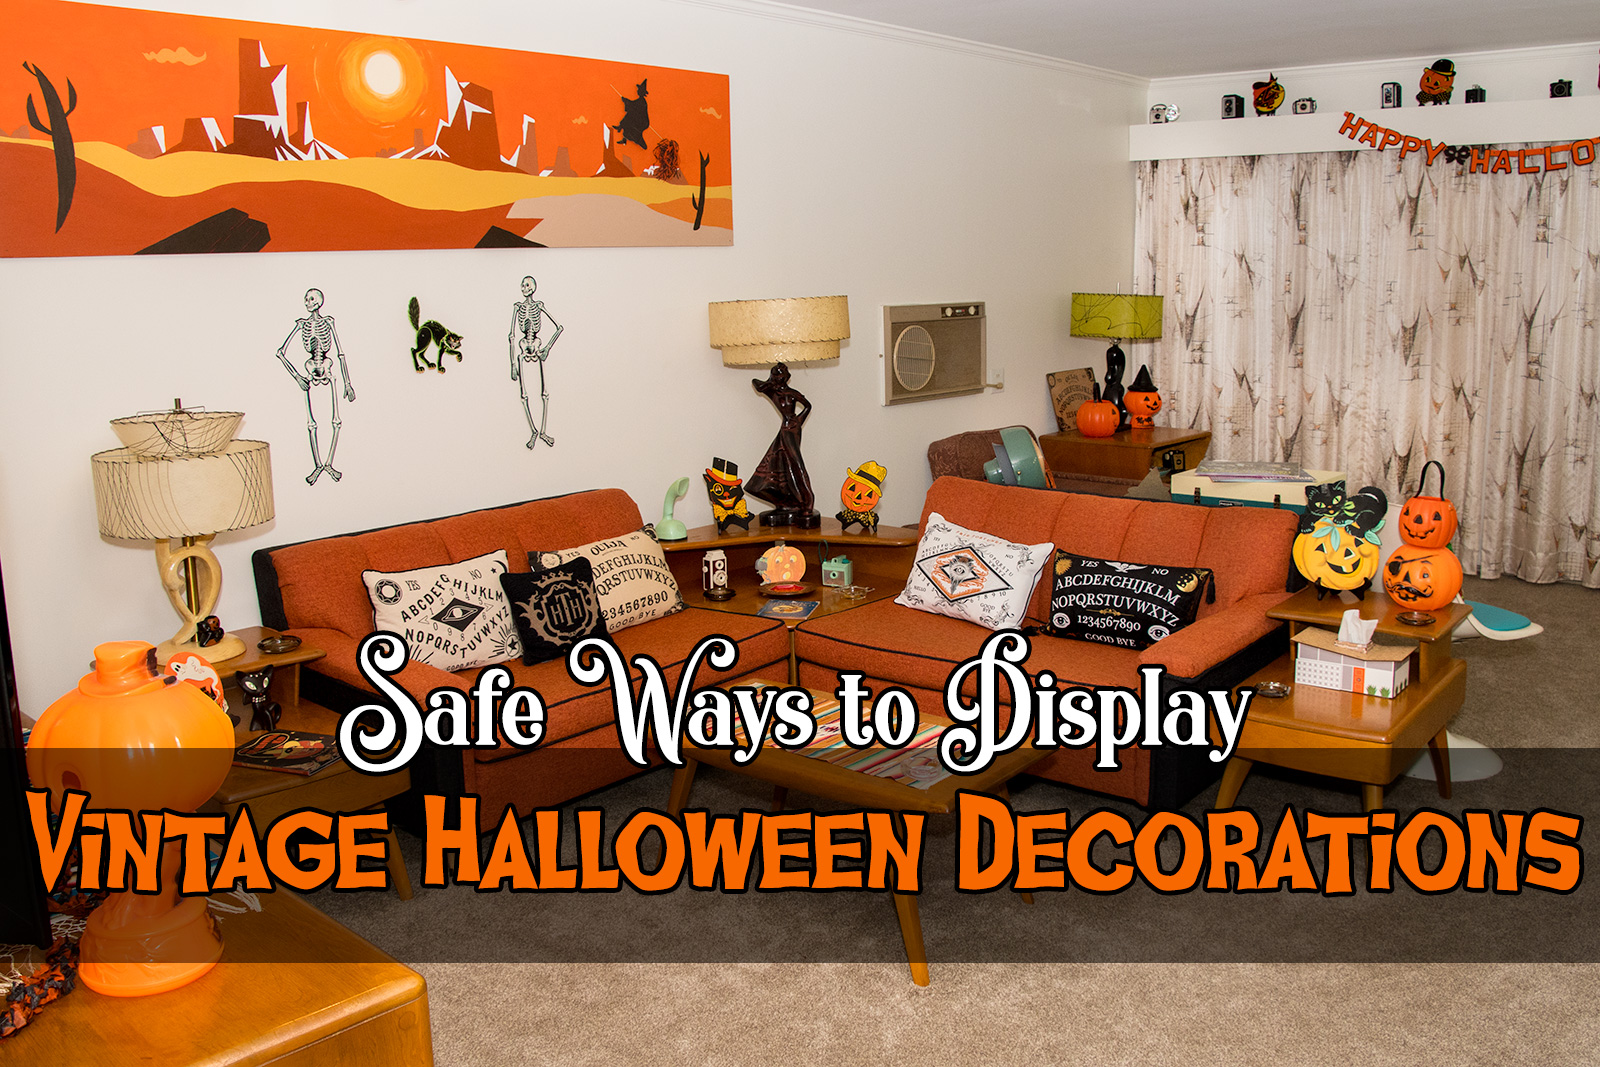 safe ways to display vintage halloween decorations | atomic redhead